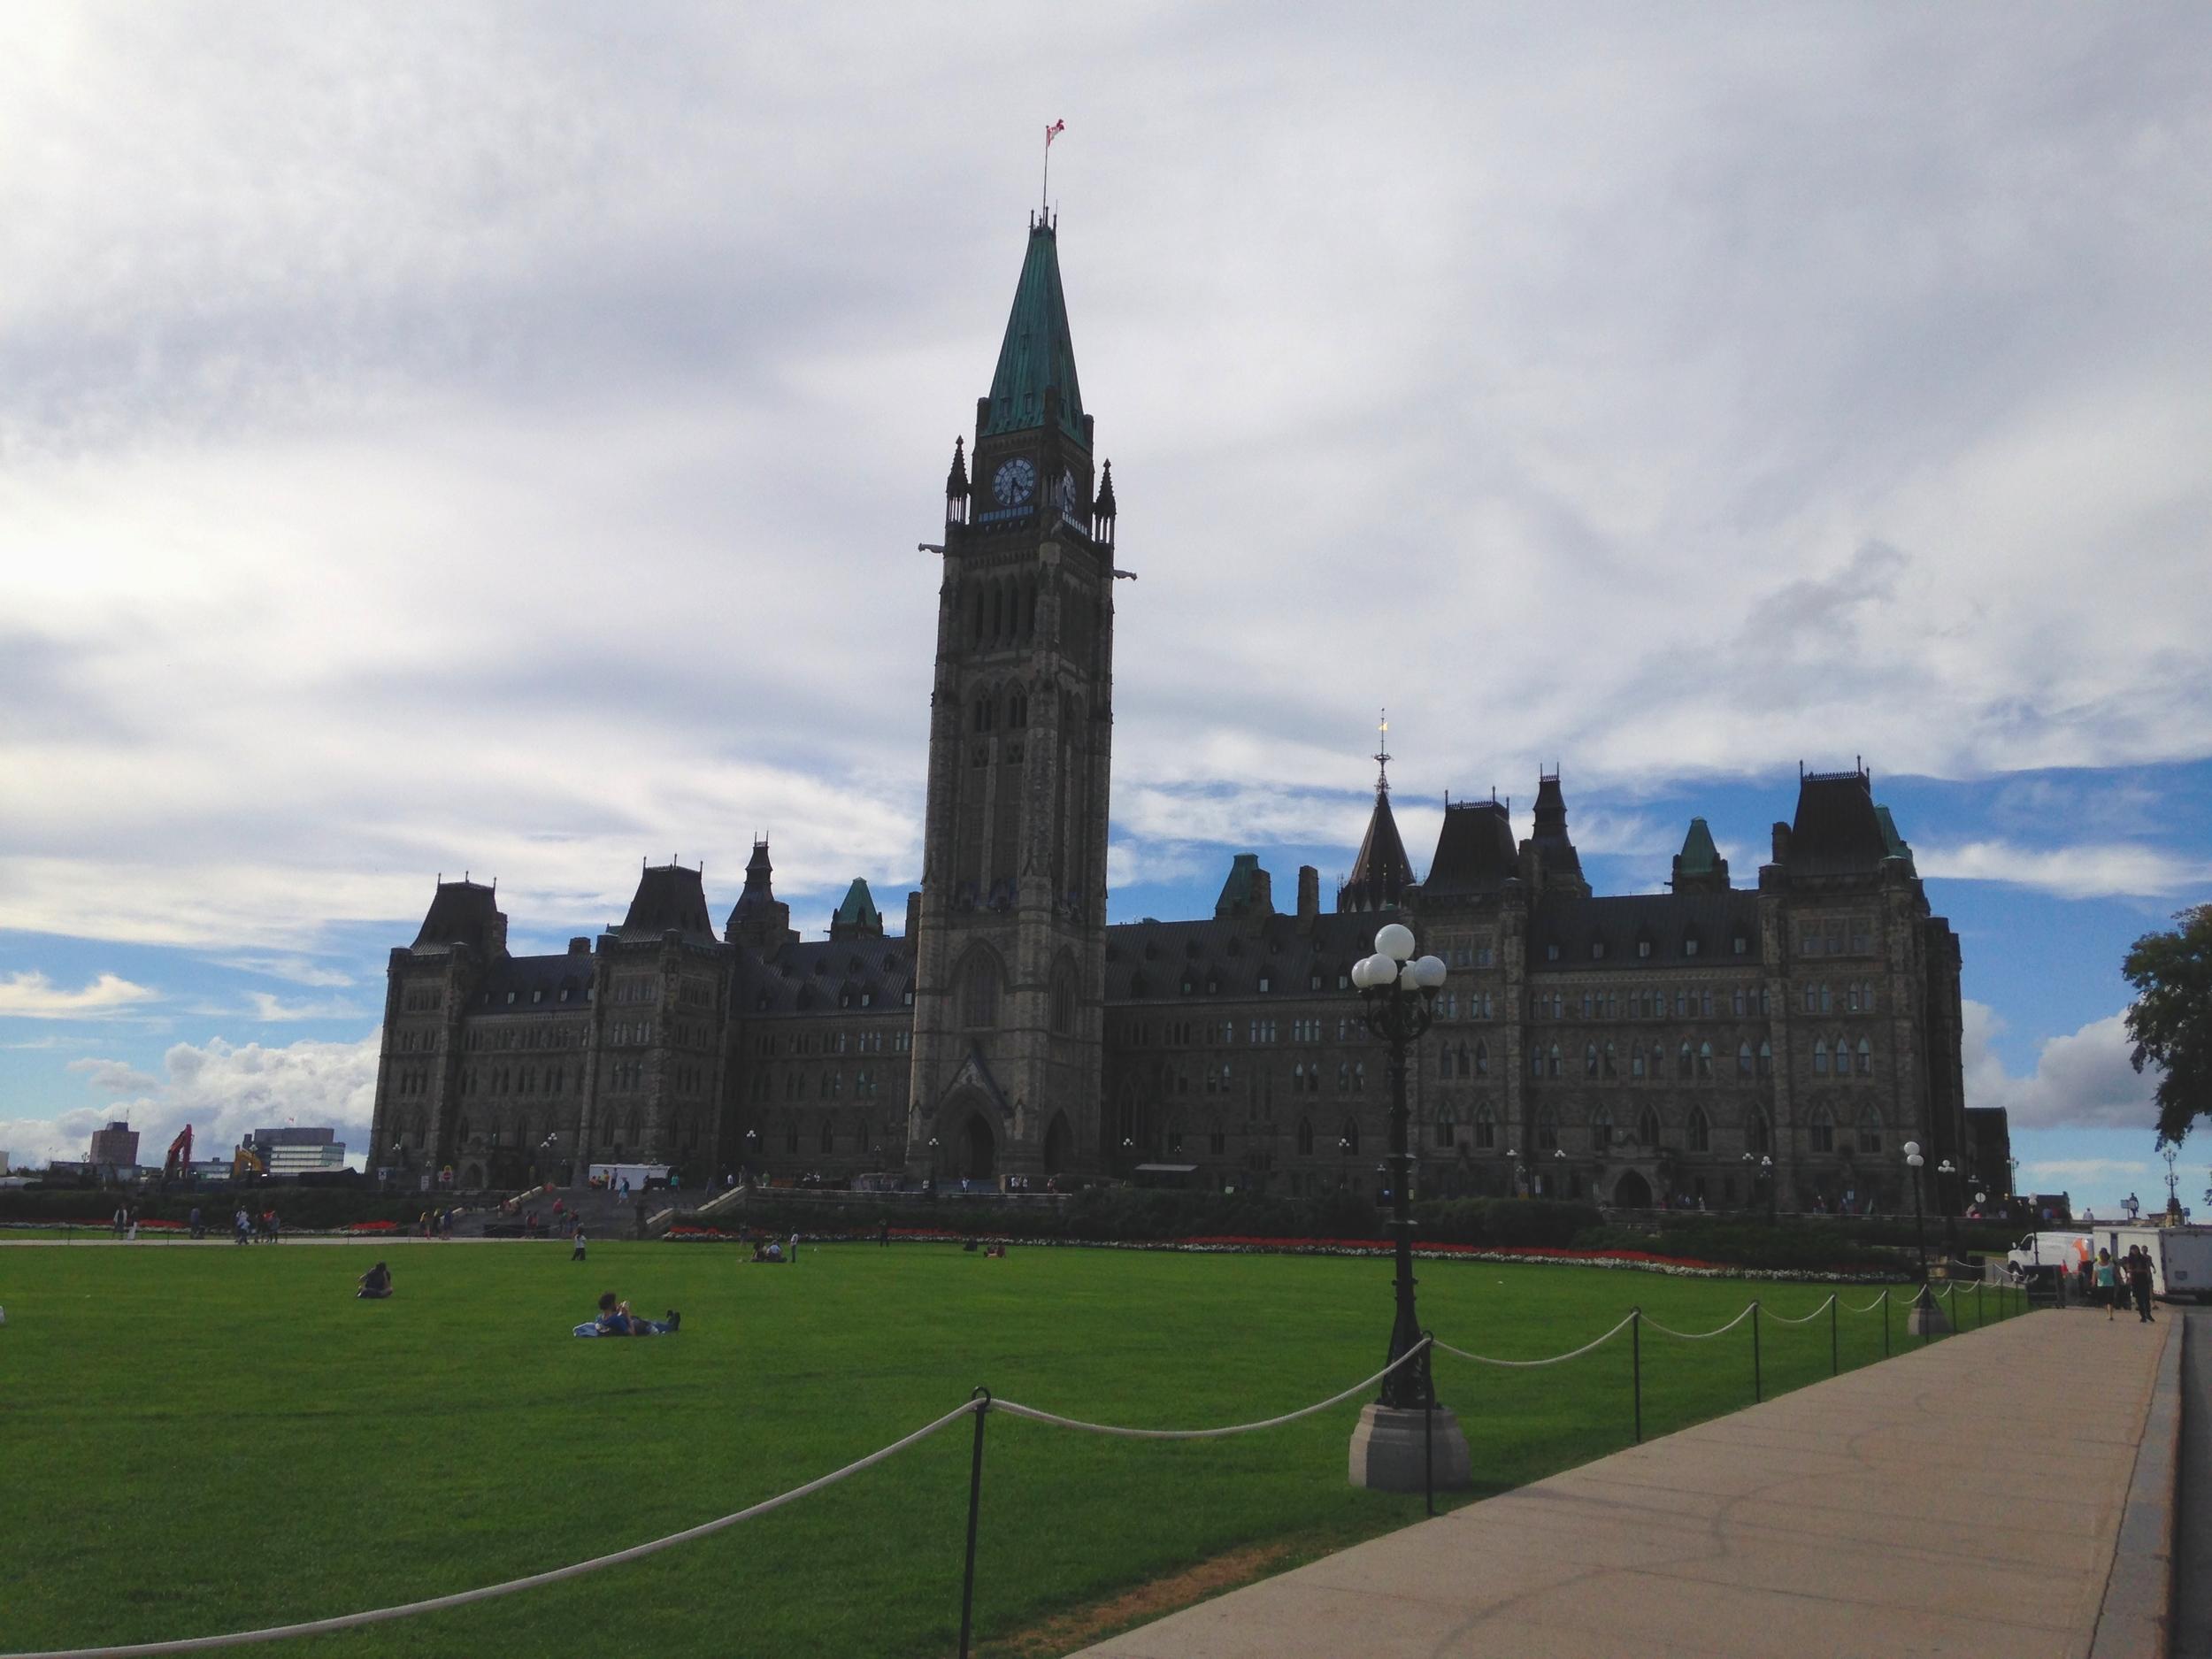 Parliament!